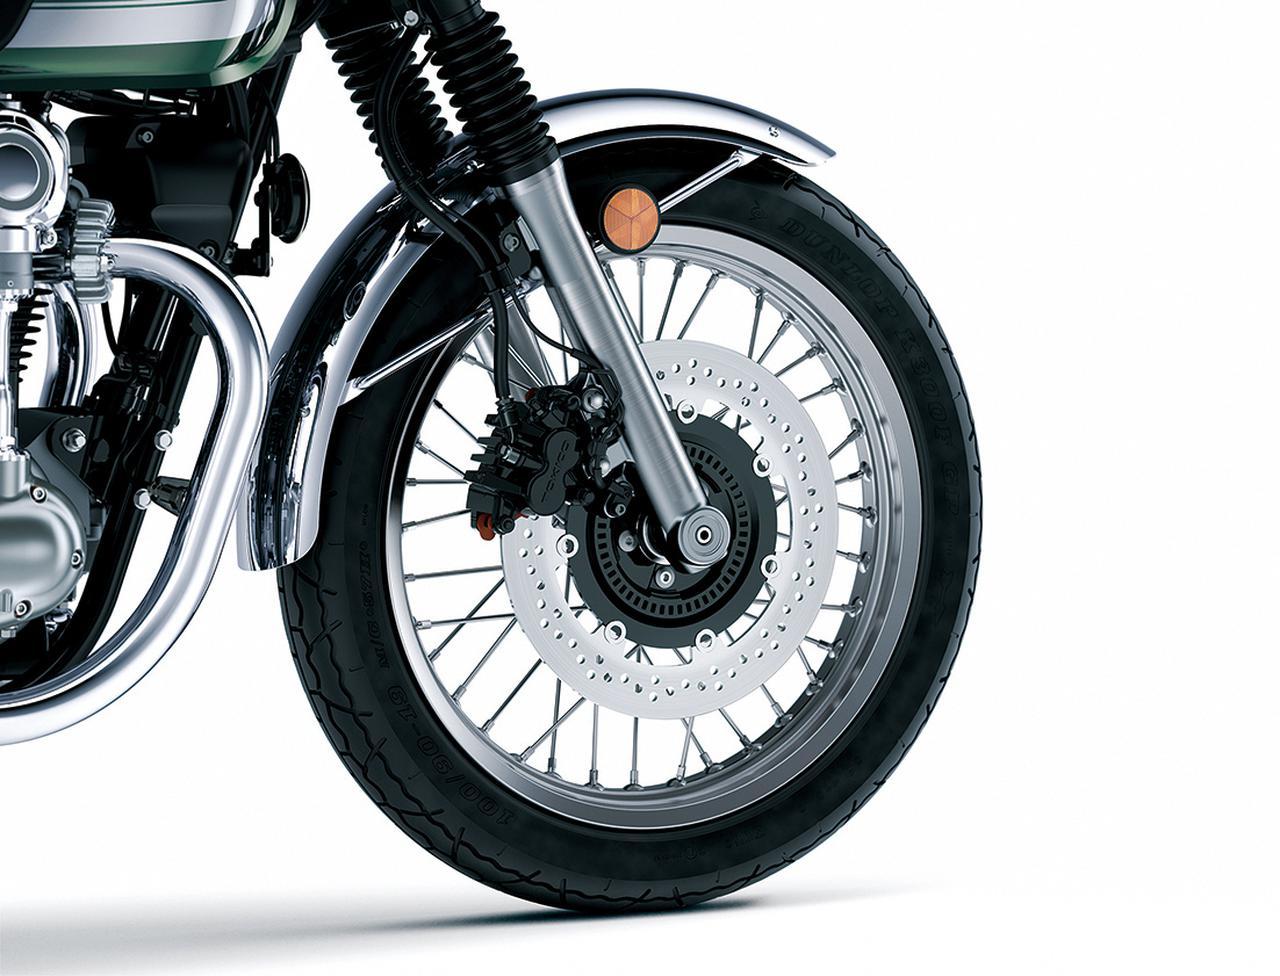 Images : 6番目の画像 - KAWASAKI W800の写真をまとめて見る! - webオートバイ